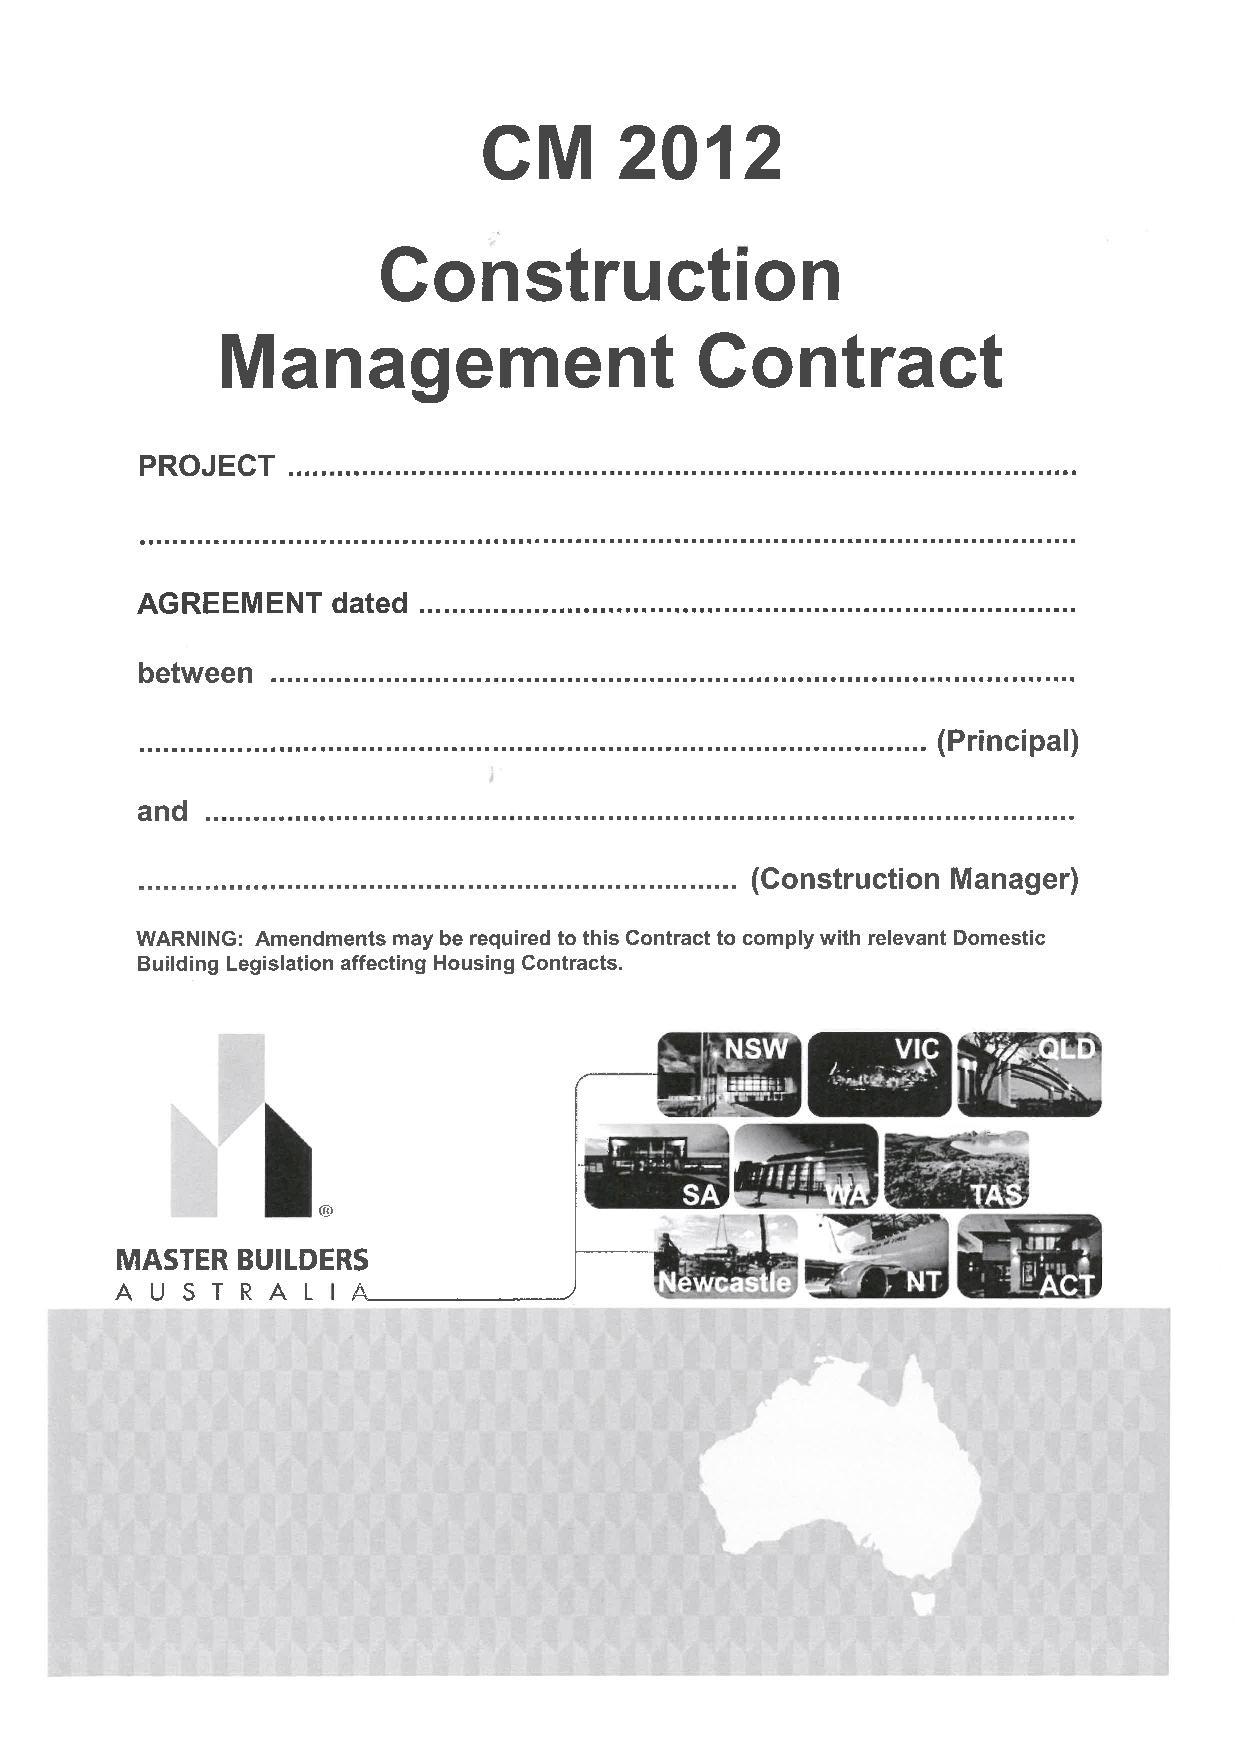 CM 2012 Construction Management Contract Master Builders WA – Construction Management Agreement